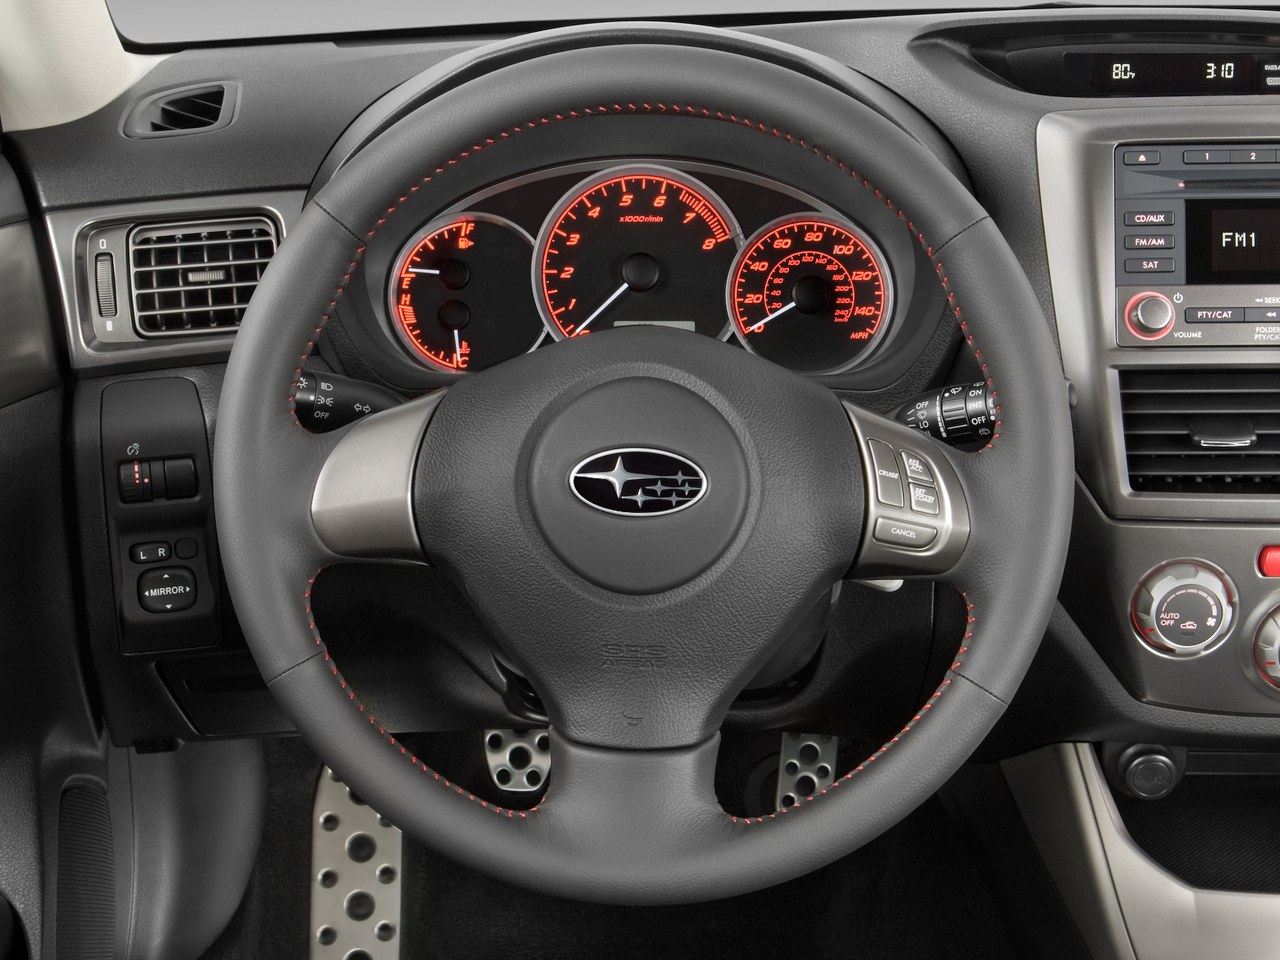 Subaru Impreza Sedan Base S Oem also Subaru Impreza Wrx Door Wagon Headlight in addition Subaru Impreza Wrx Door Wagon Steering Wheel together with B Fa Cd Bab Ba B E B A furthermore . on 2004 subaru wrx wagon specs